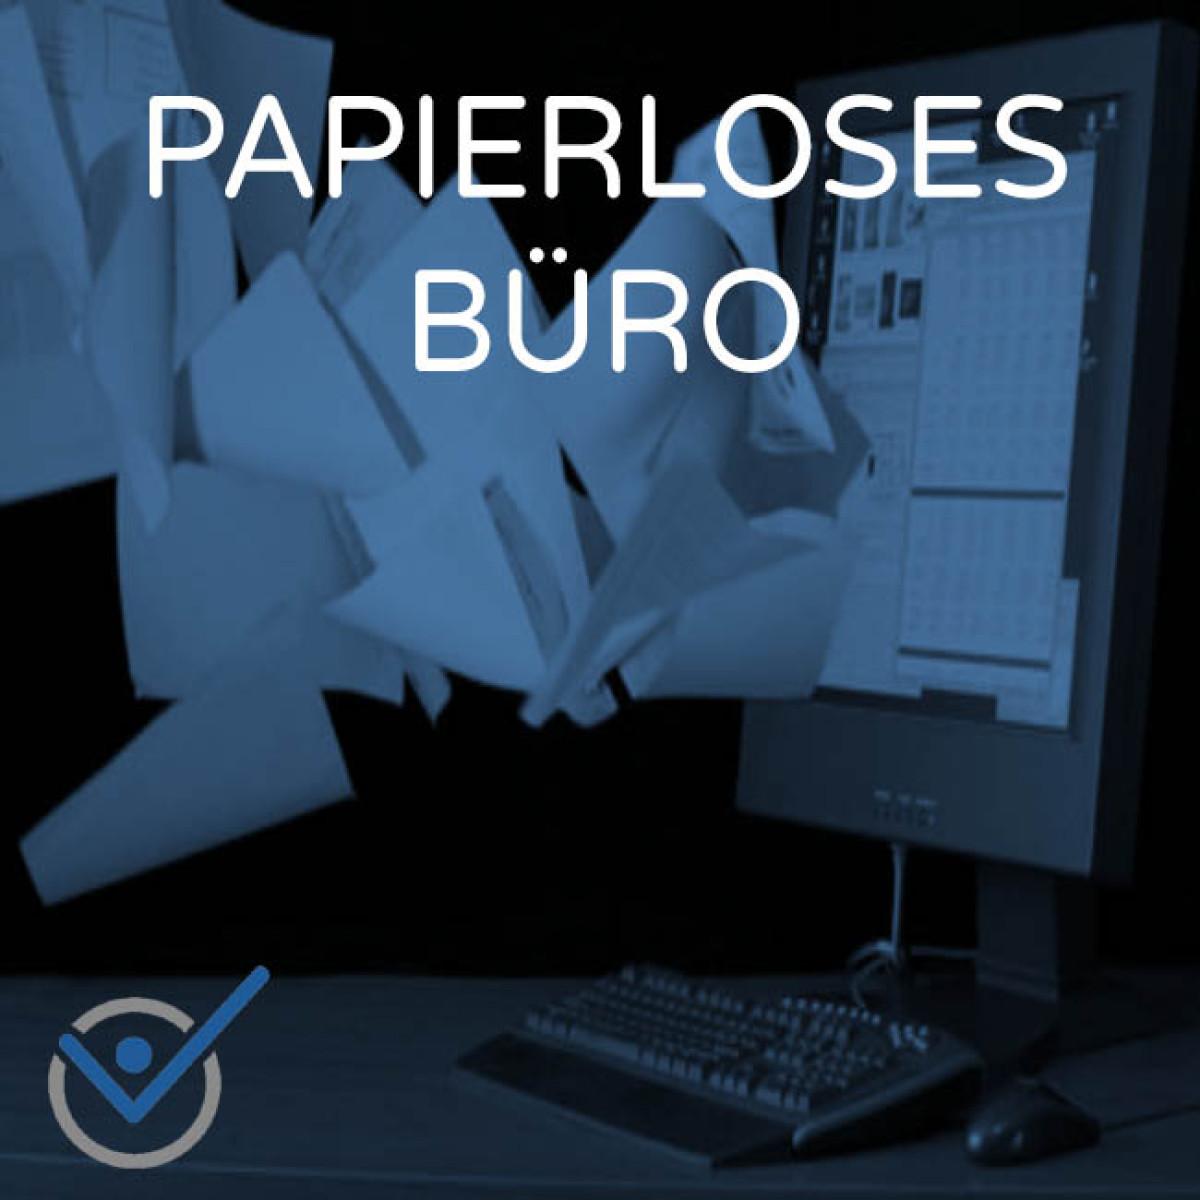 Papierloses Büro papierlos werden